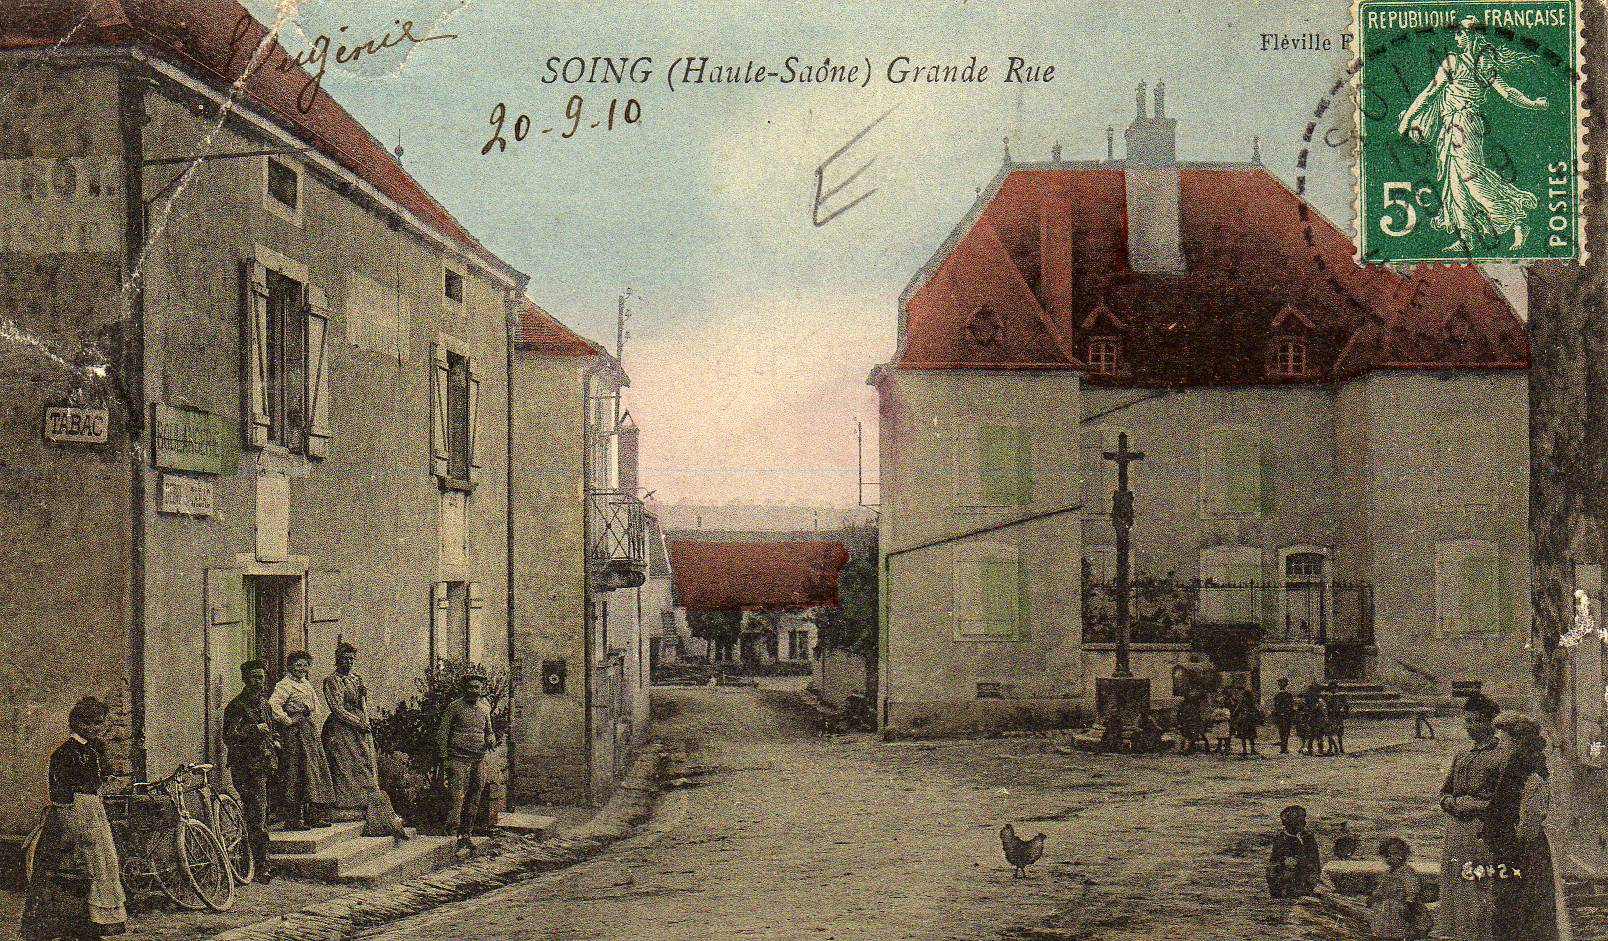 grande-rue-soing-croix